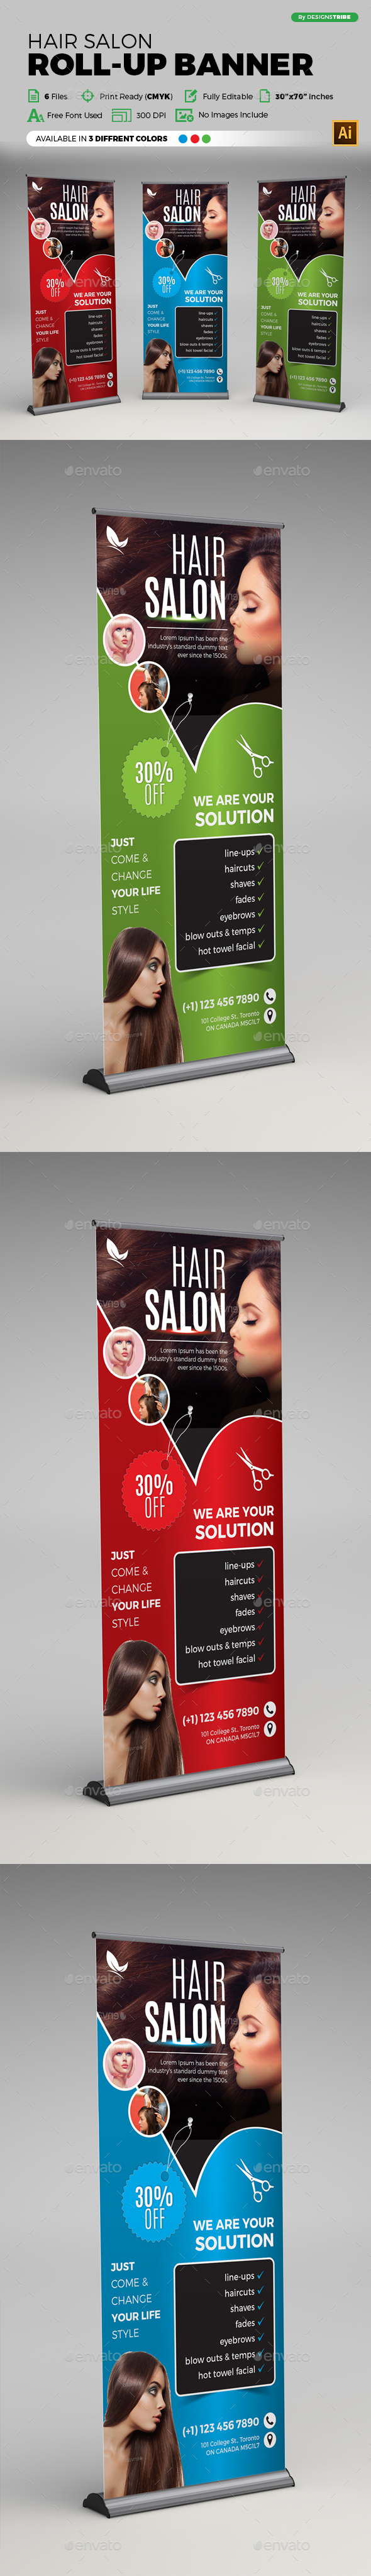 Hair Salon Roll-up Banner - Signage Print Templates